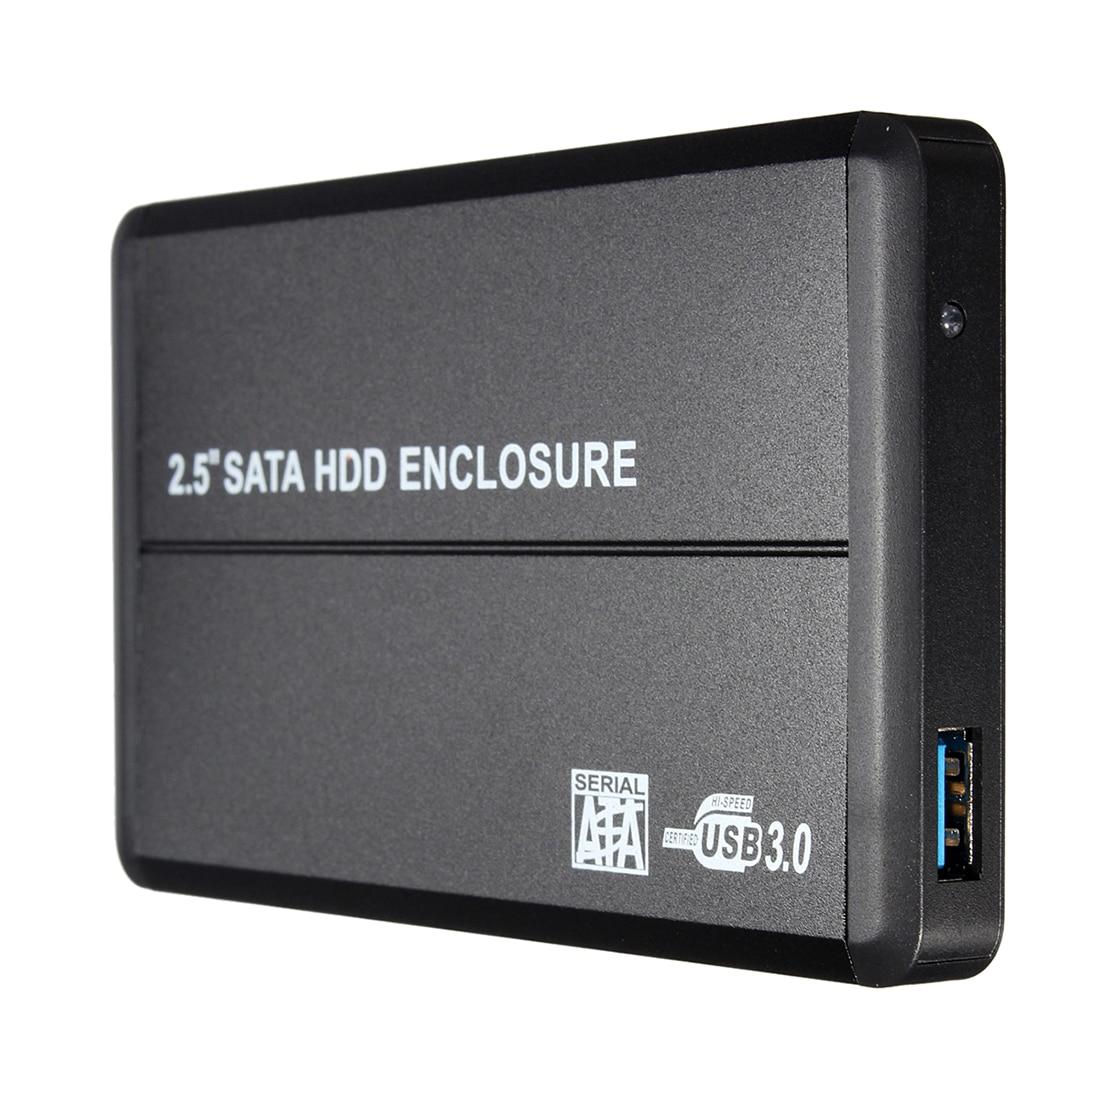 "Unidad de disco duro HDD USB 3,0 SATA 2,5 "", caja de cierre externa para ordenador portátil, PC negro"